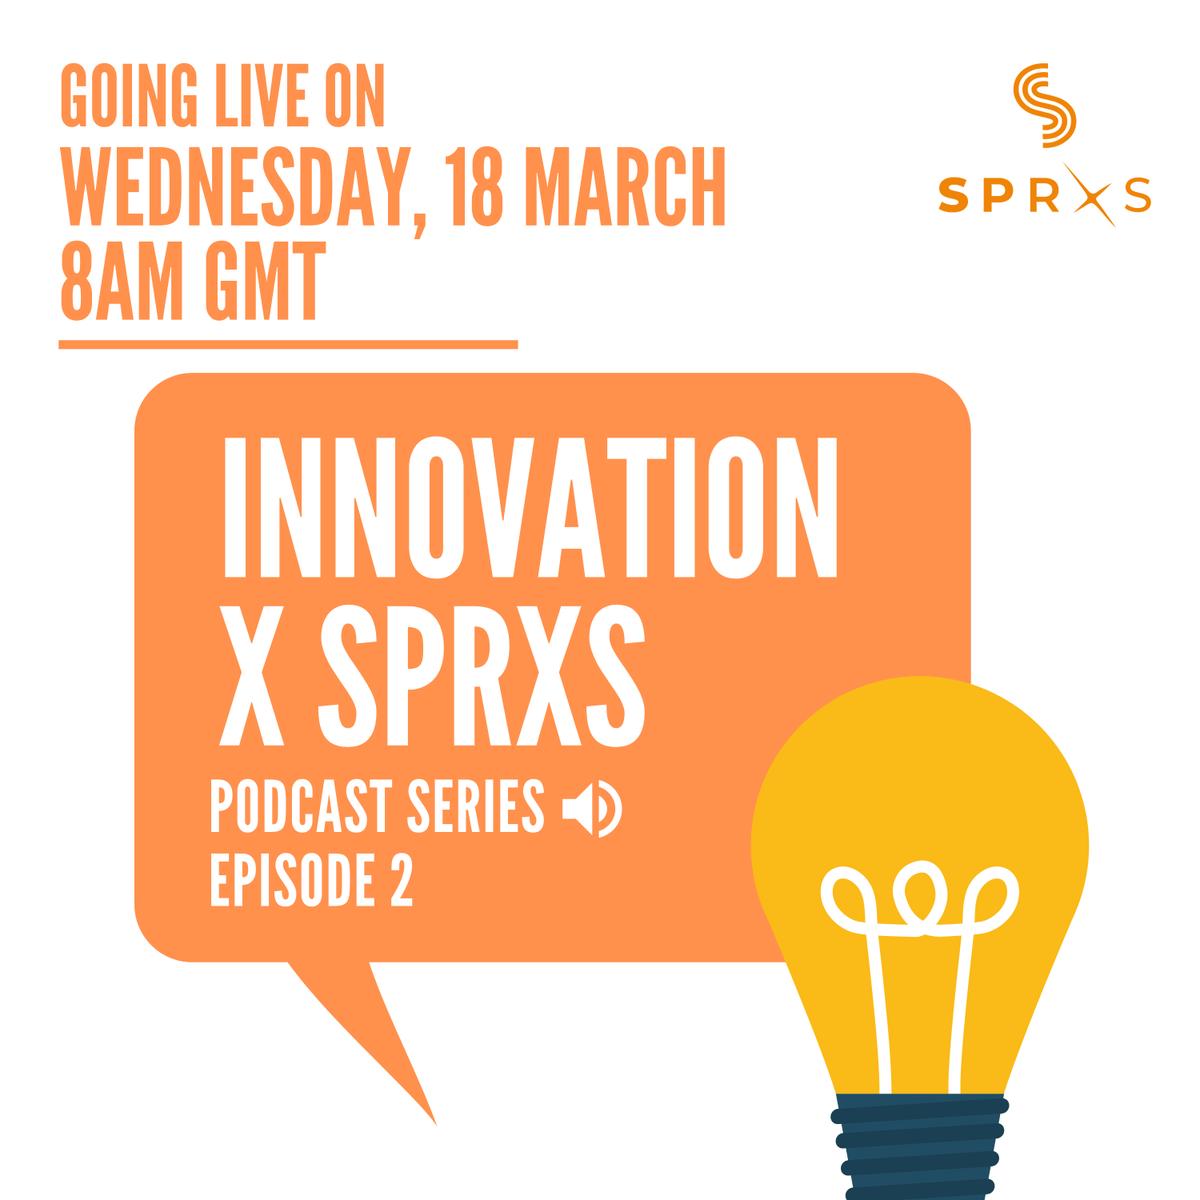 PODCAST S1E2   New episode going live this Wednesday, 8am.   #podcast #studententrepreneurs #business #entrepreneurs #startups #mondaymotivationpic.twitter.com/70lRFiCsIy